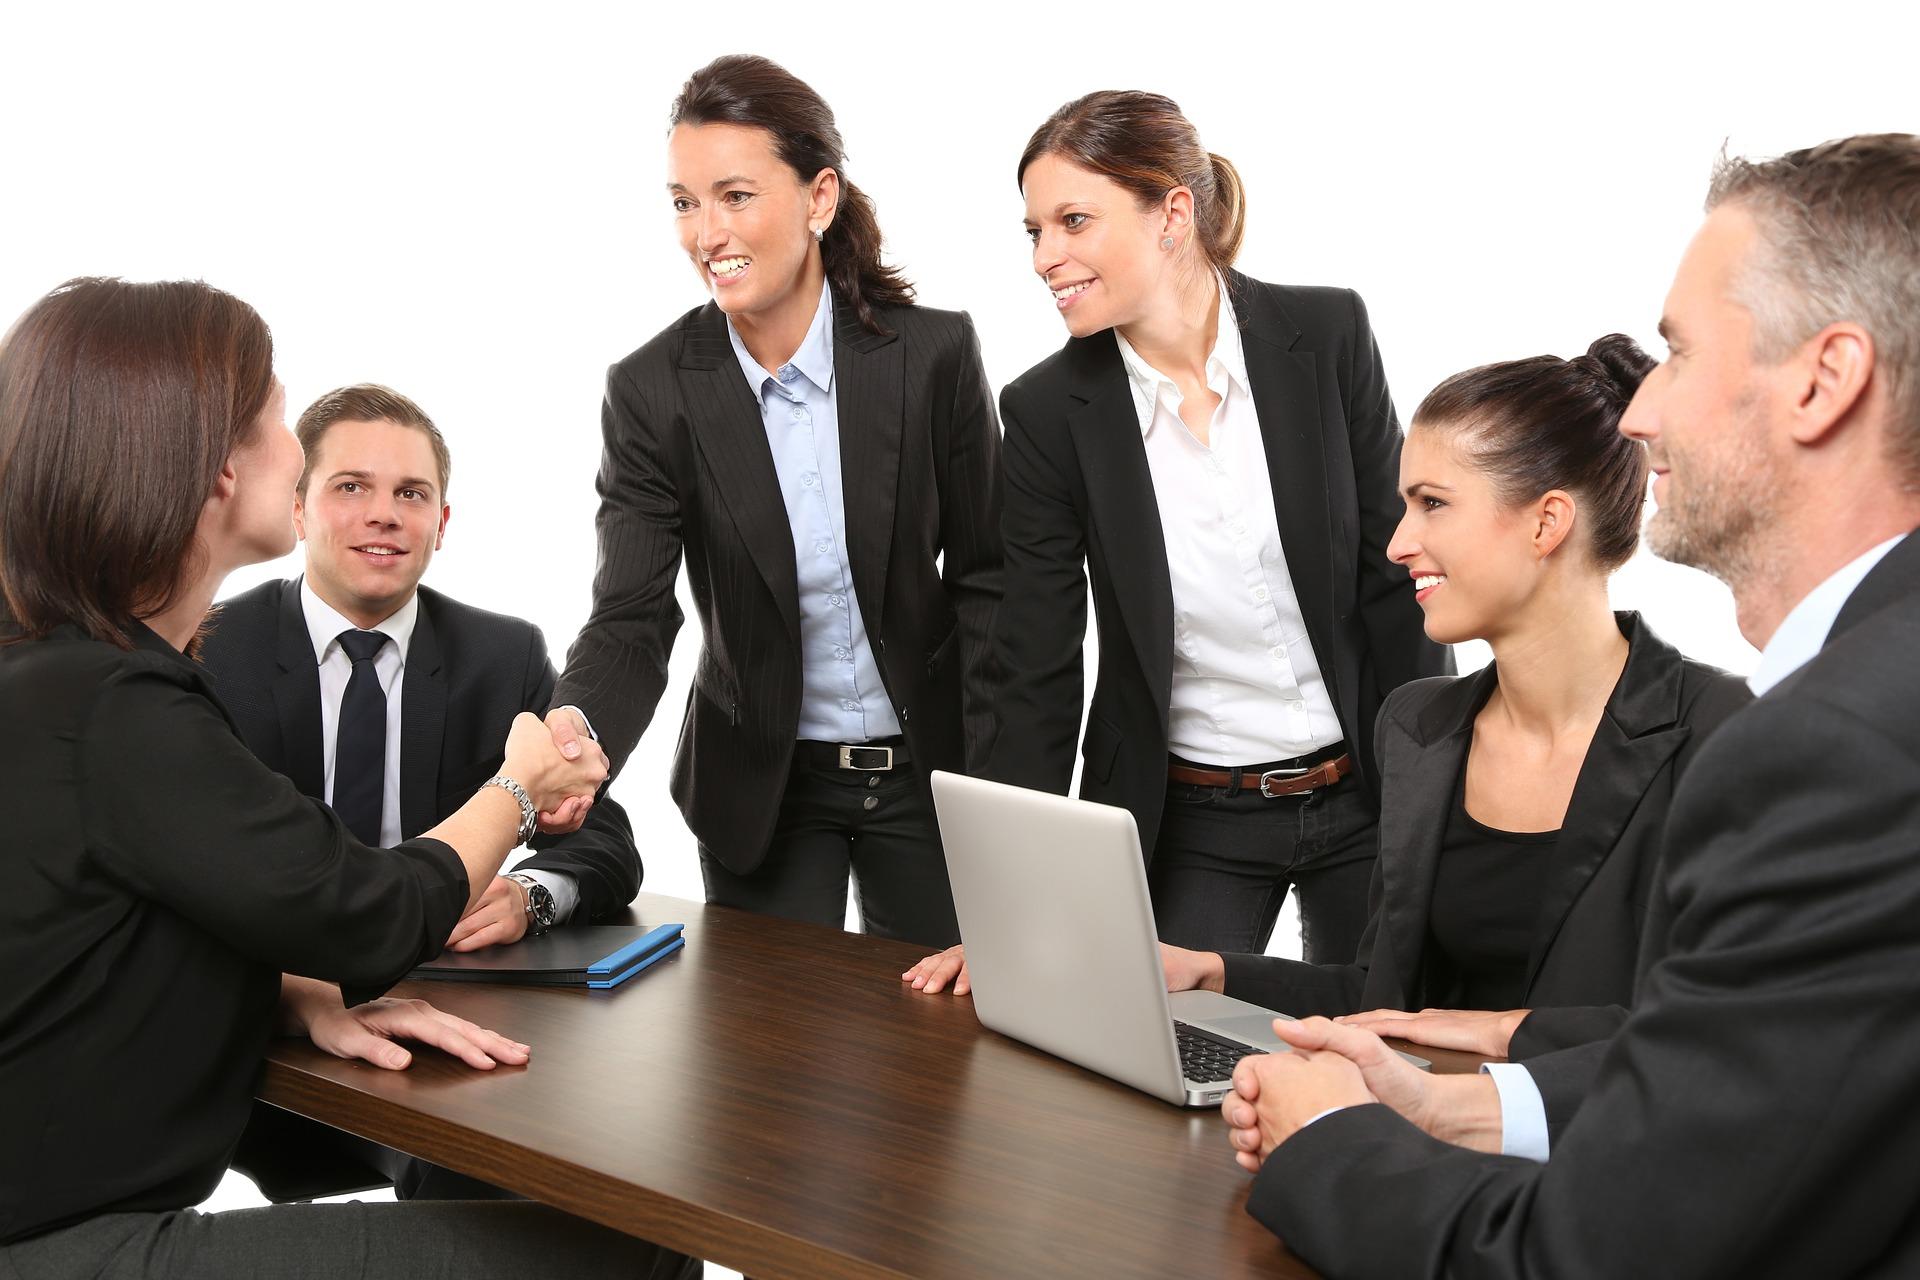 entrepreneure leader manager difficulté gestion organisation planification